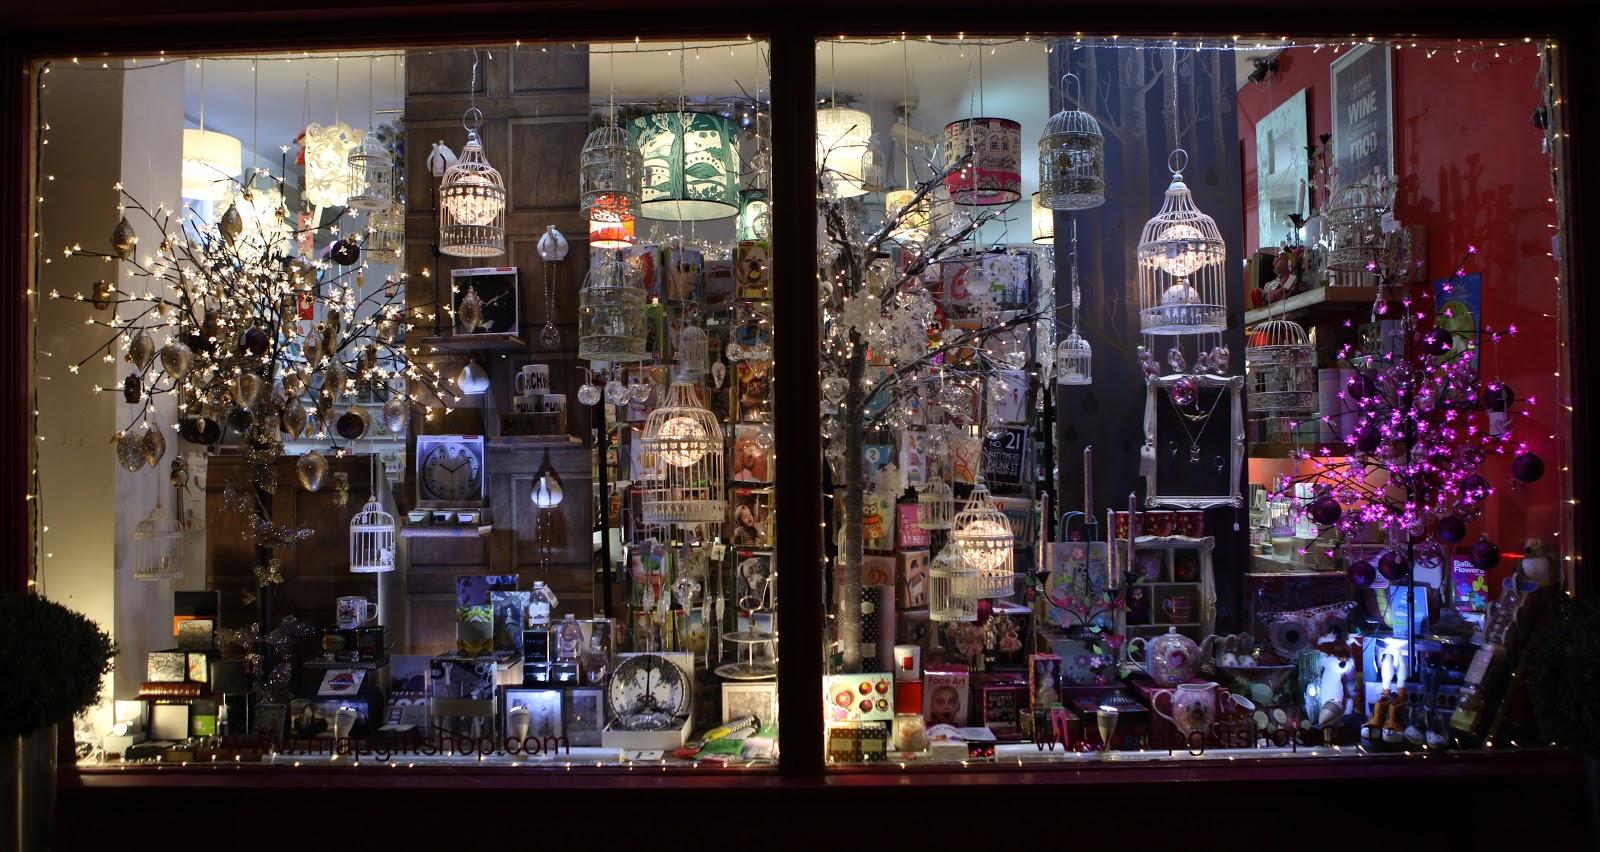 Christmas Decoration Ideas For Shop Windows